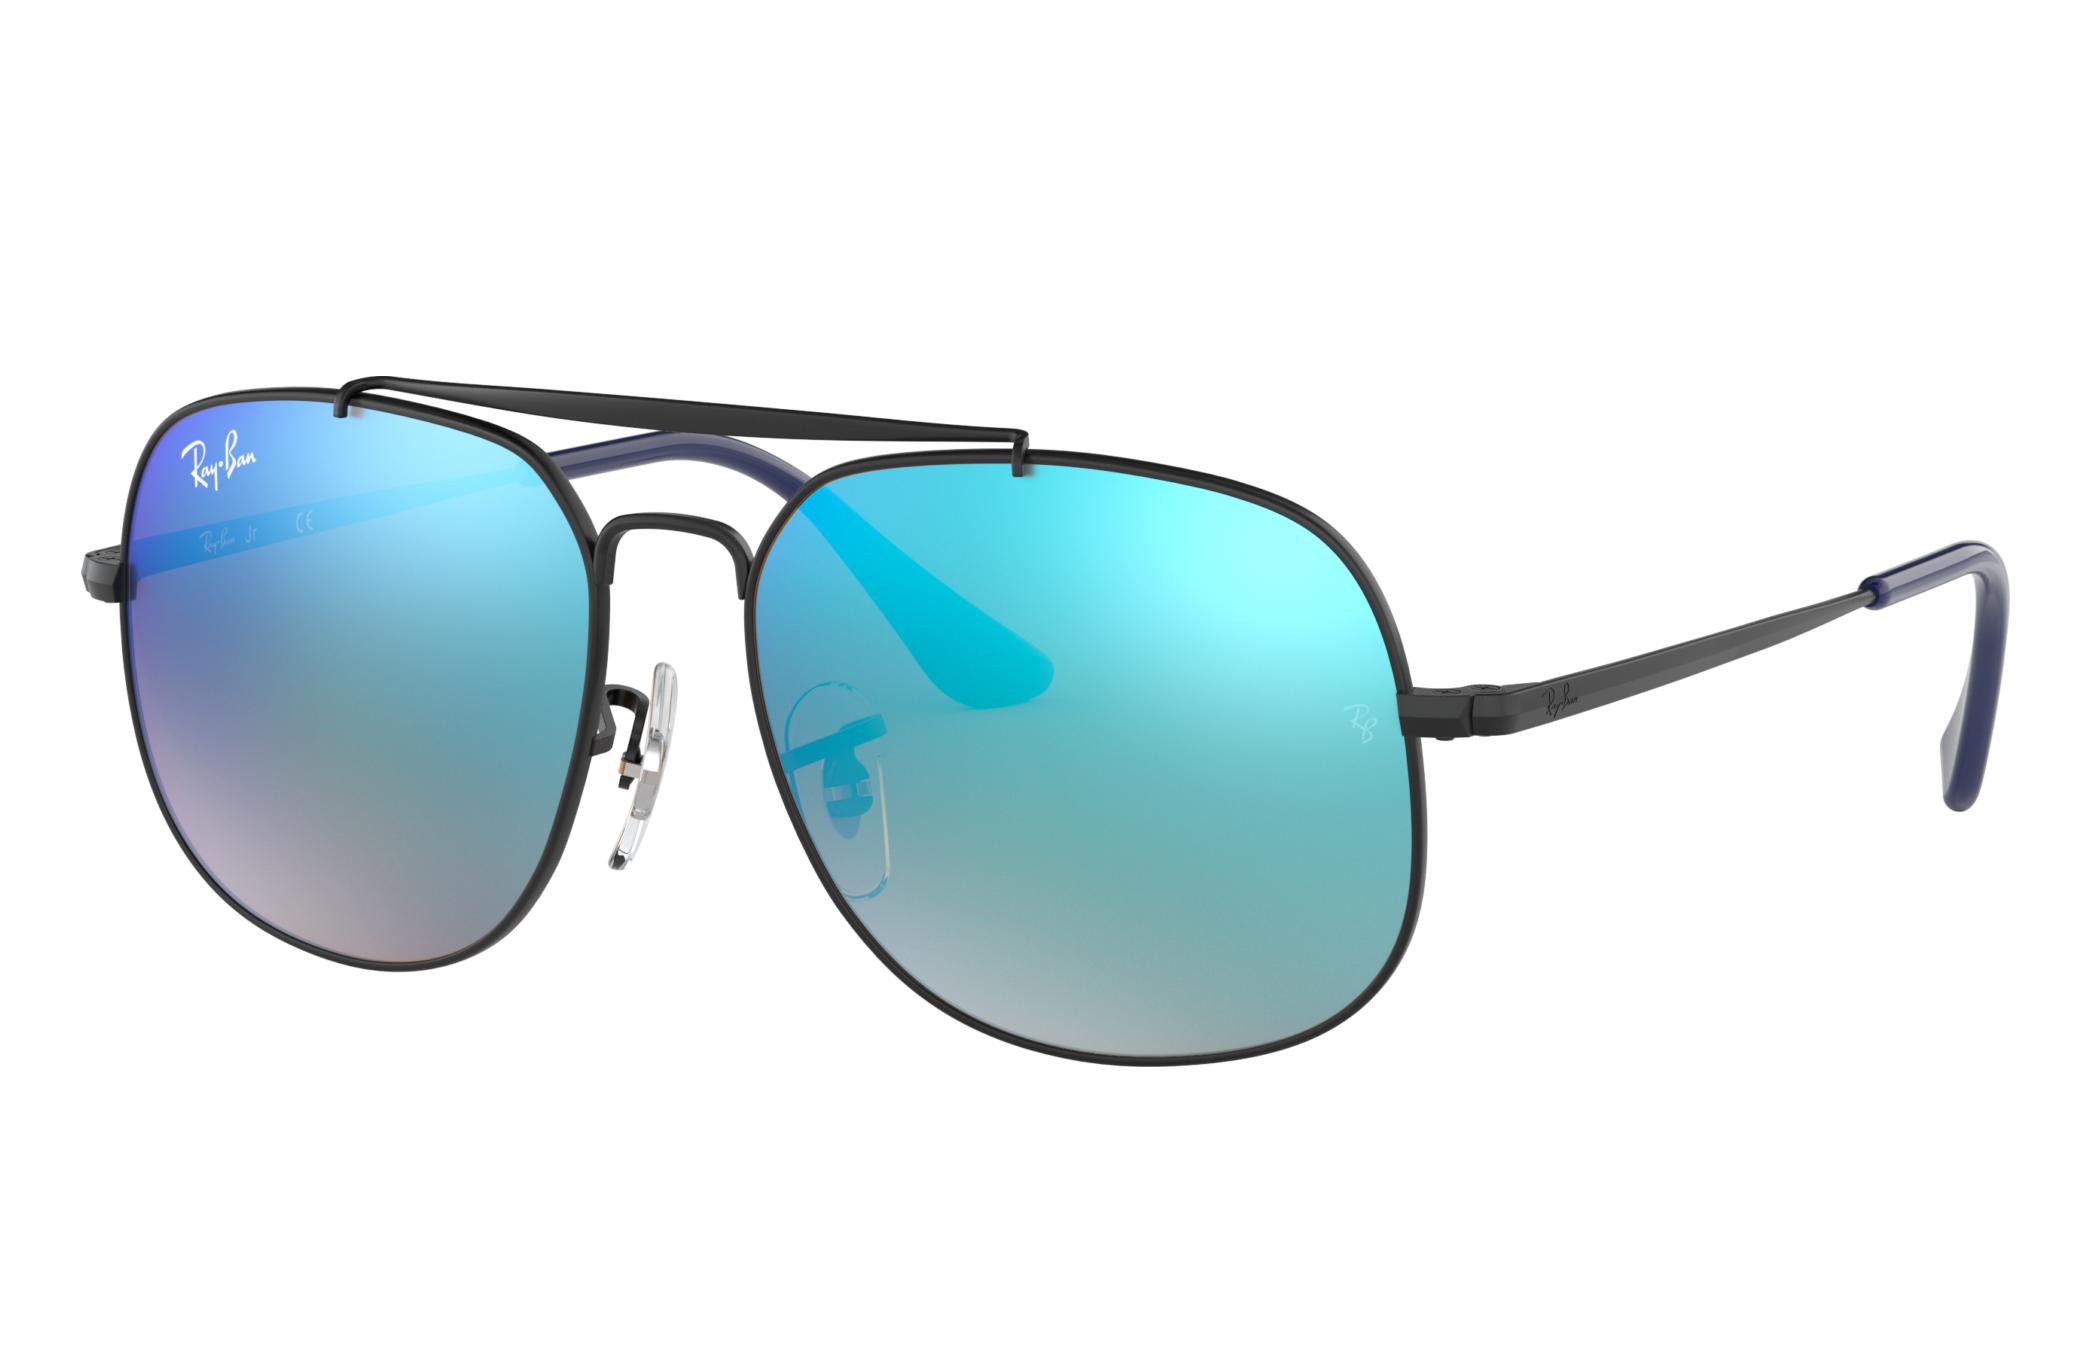 Ray-Ban General Junior Black, Blue Lenses - RJ9561S